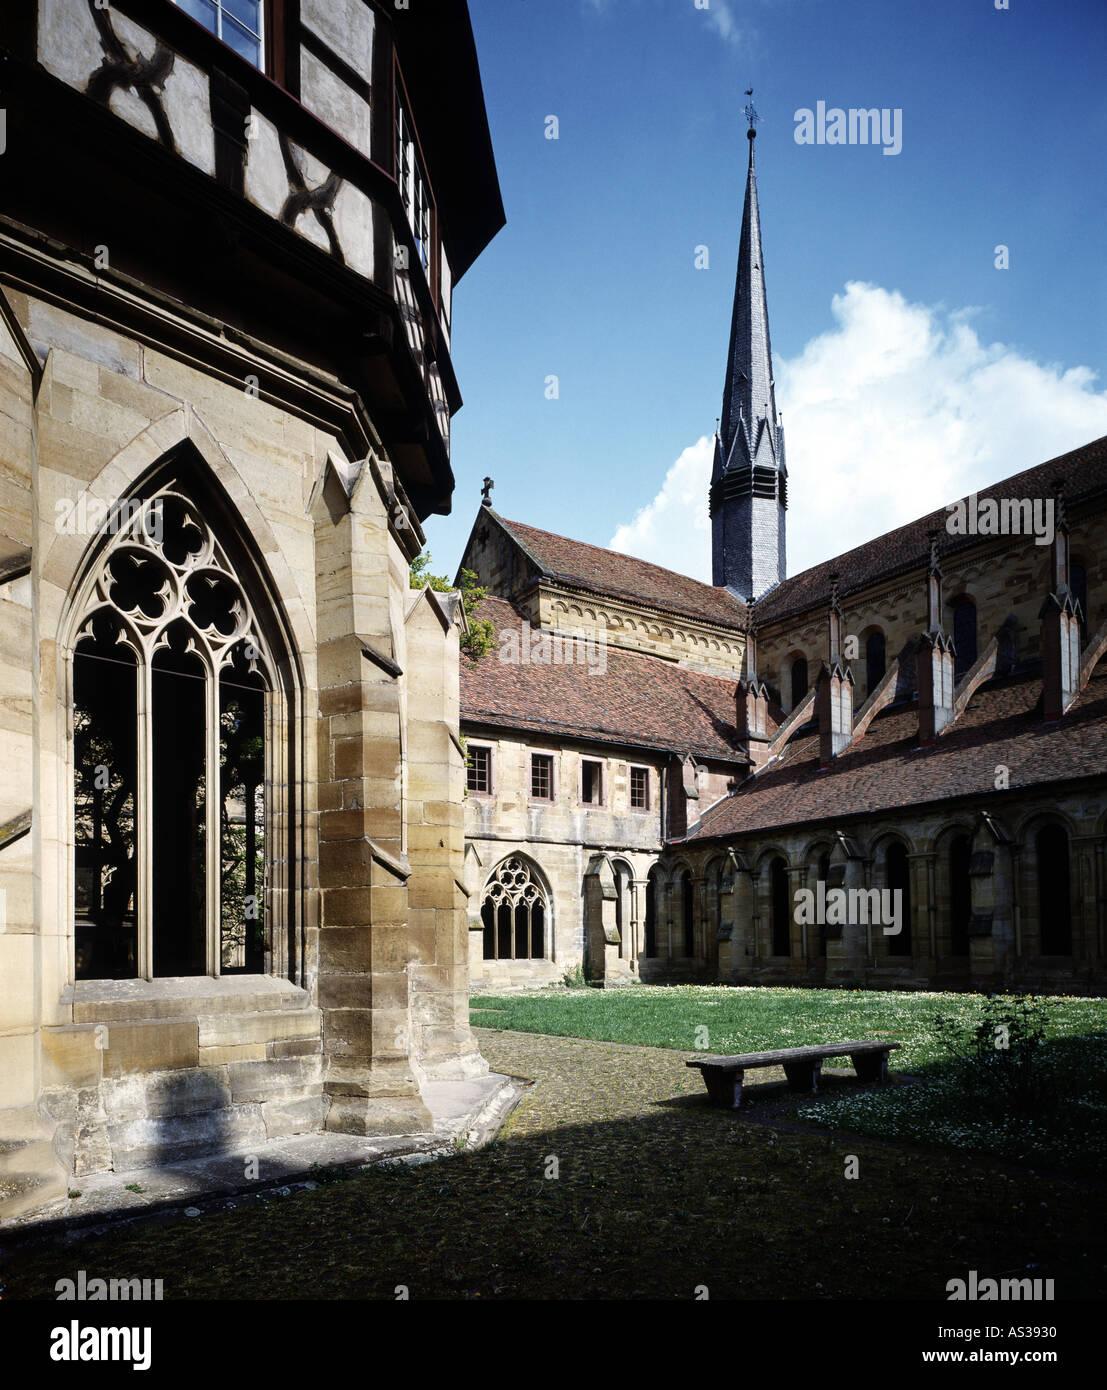 Maulbronn, Klosterkirche, Brunnenhaus Stock Photo